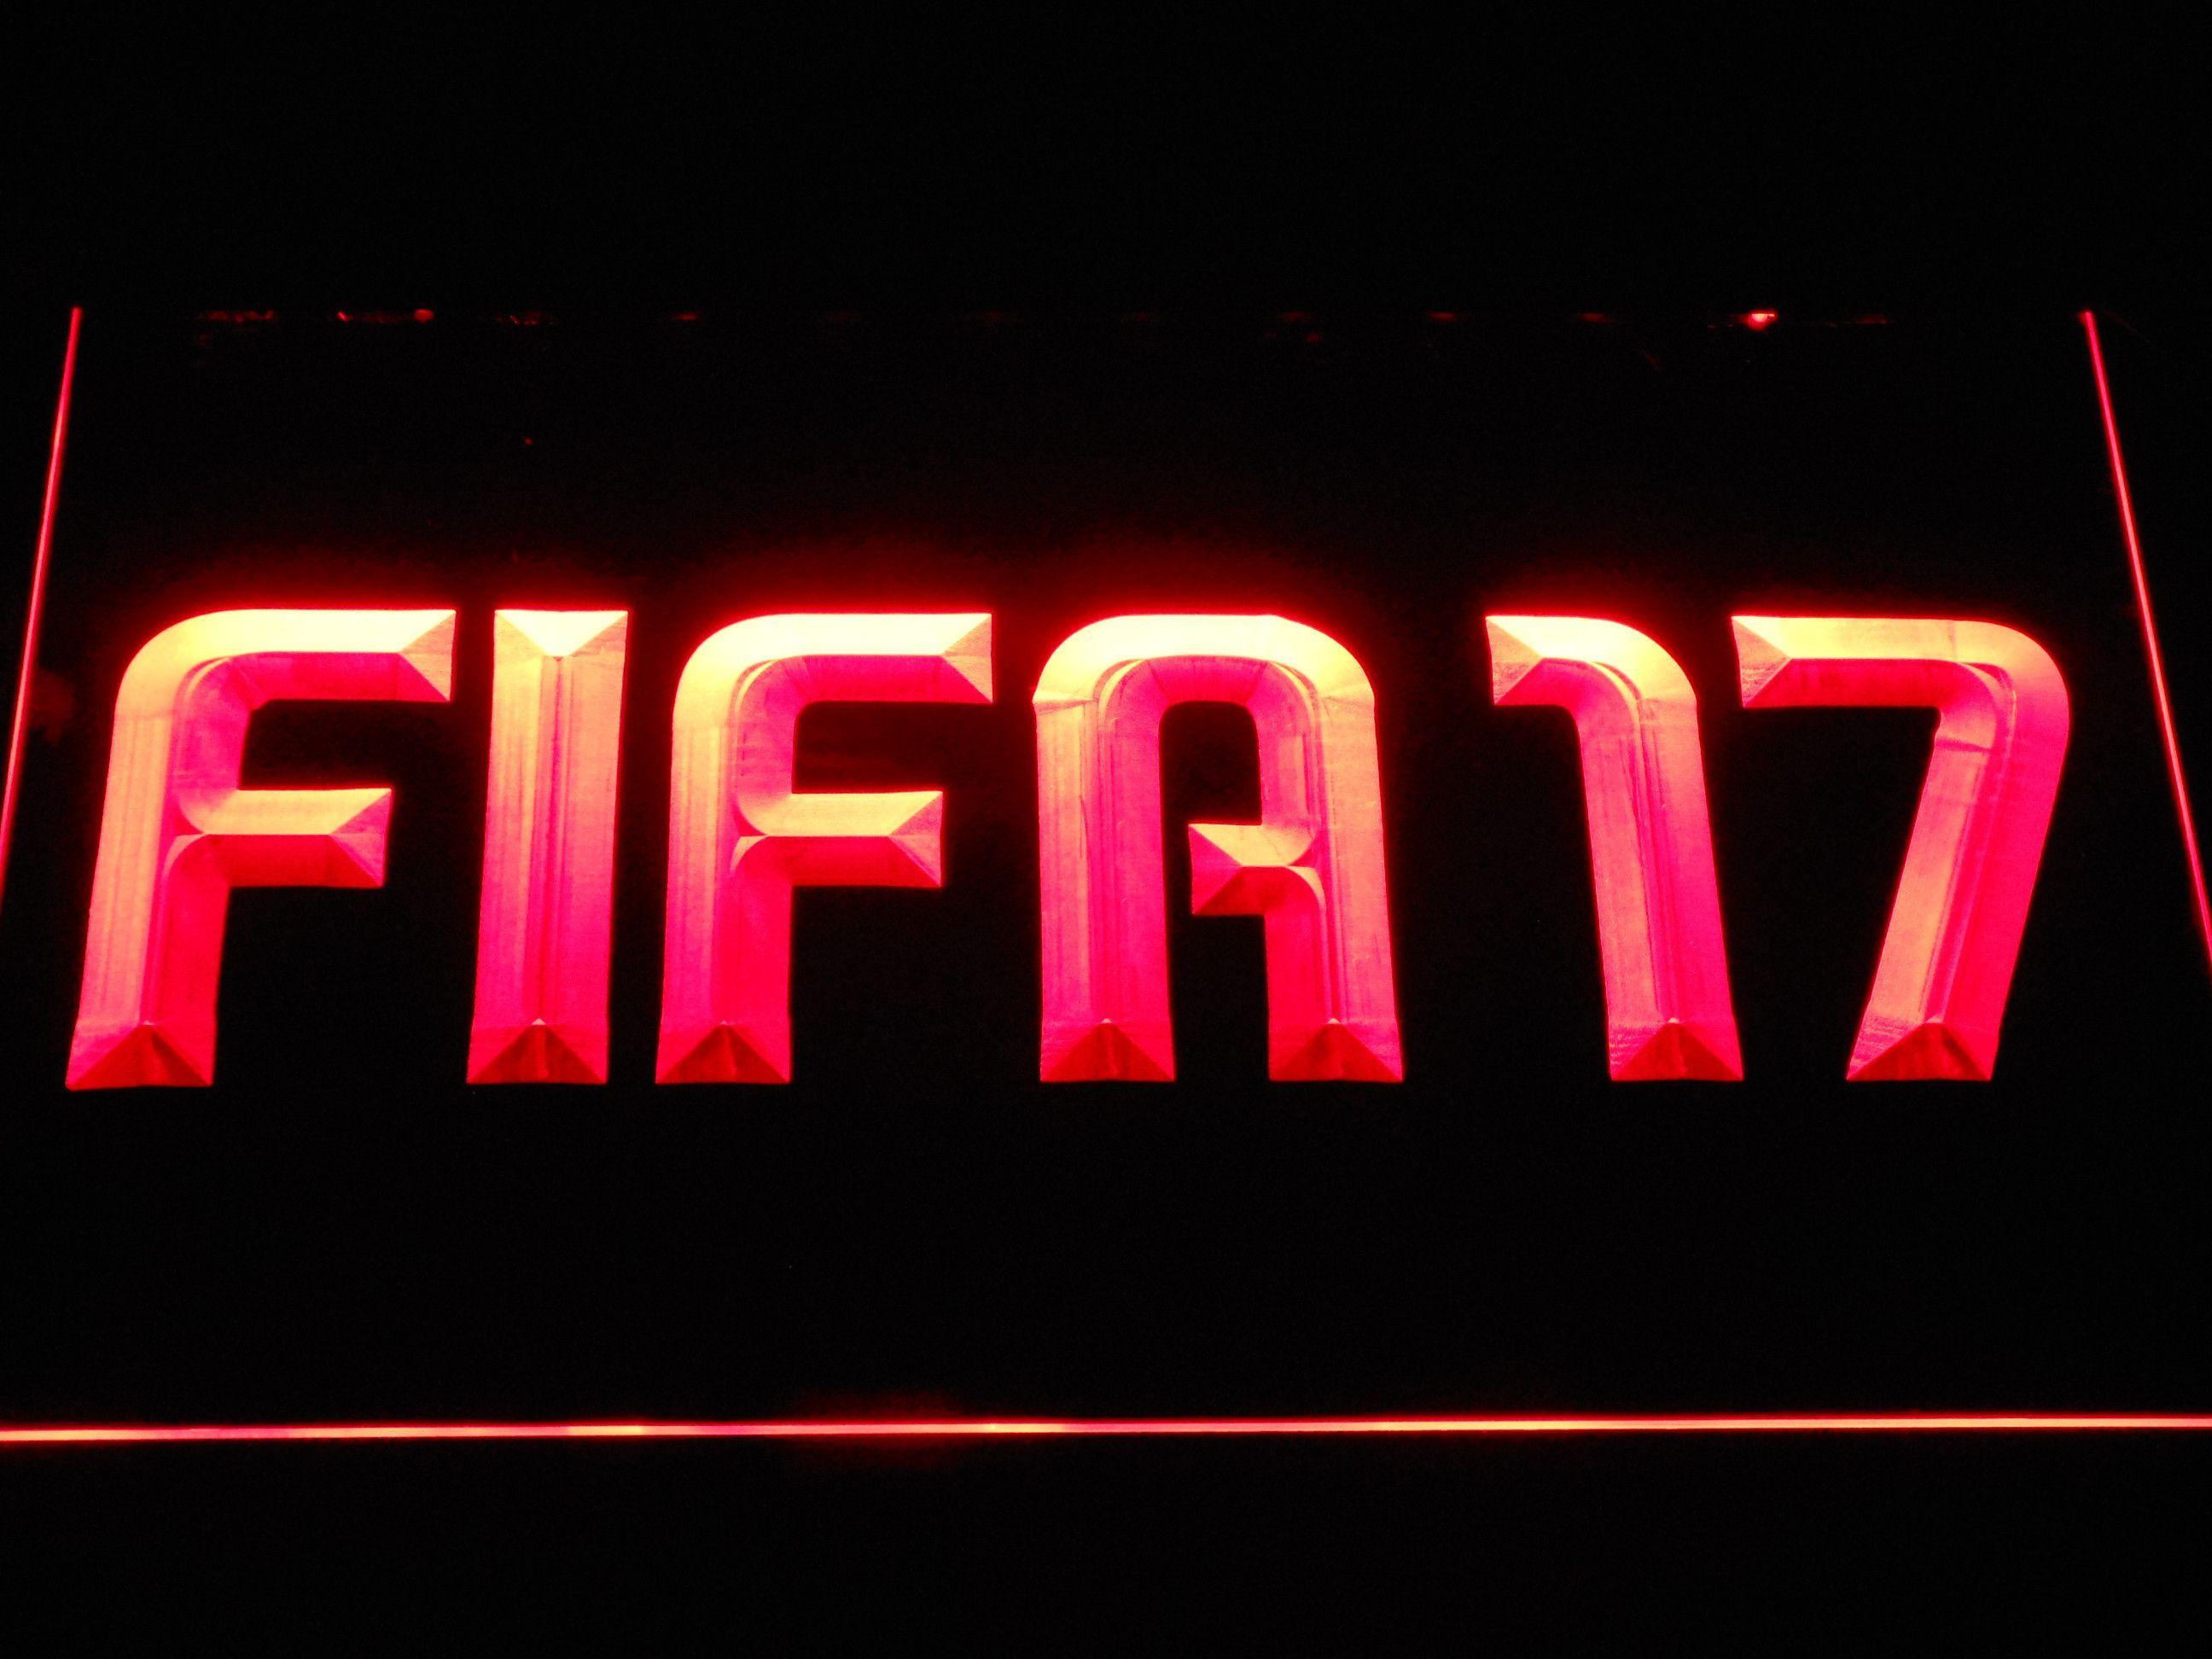 FIFA 17 LED Neon Sign